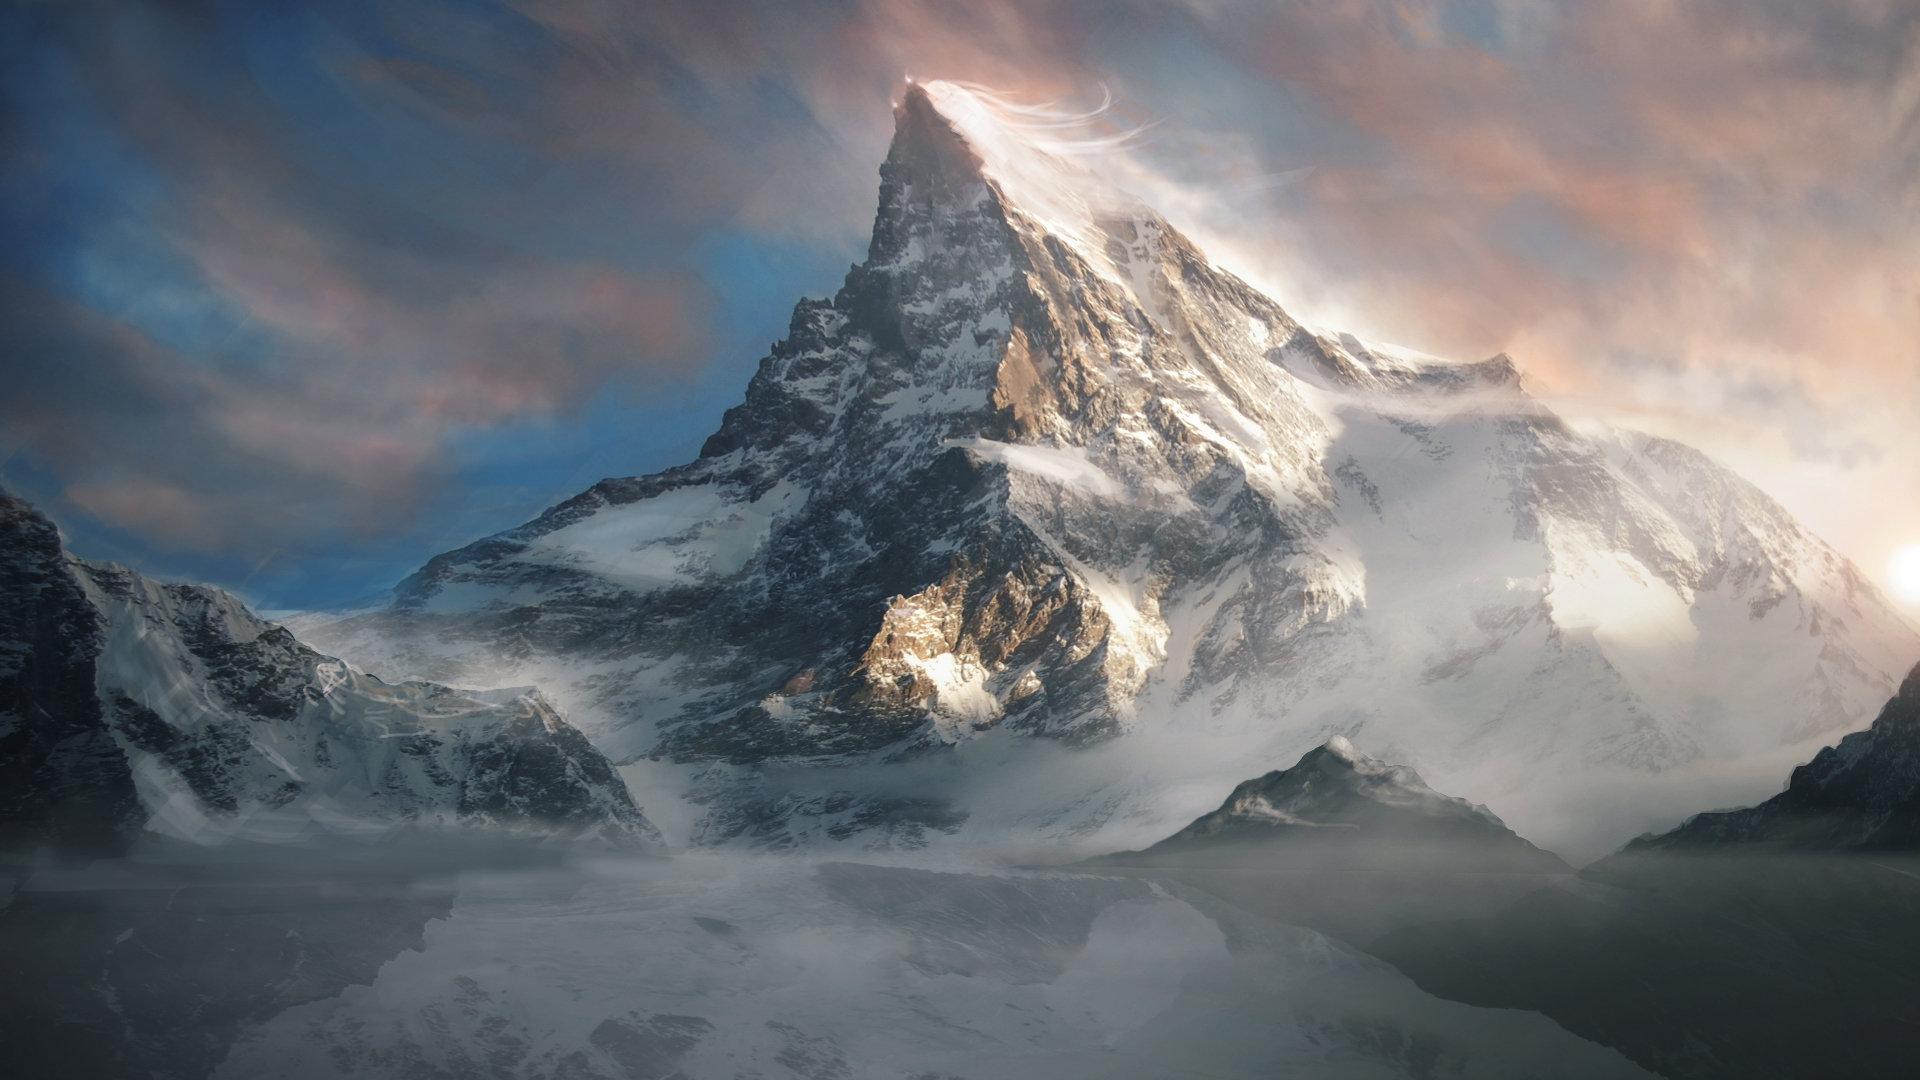 Thibault Houdon Lonely Mountain